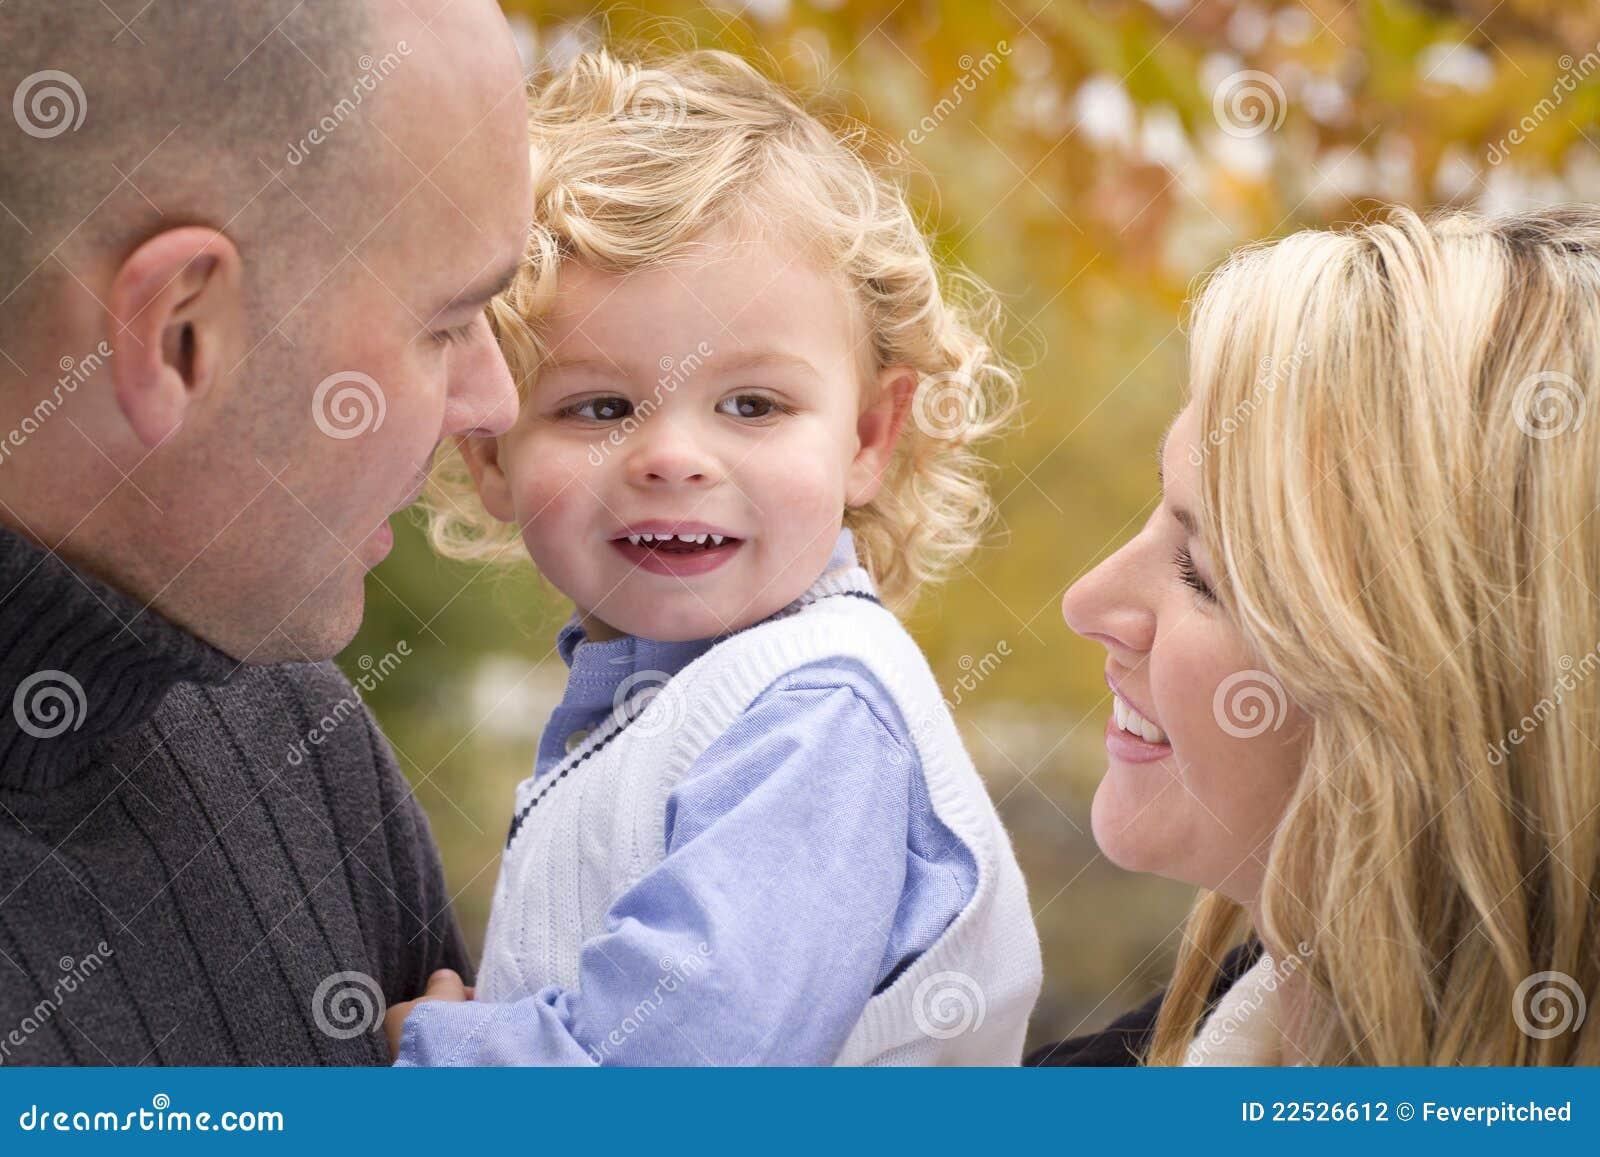 Parents of young children?